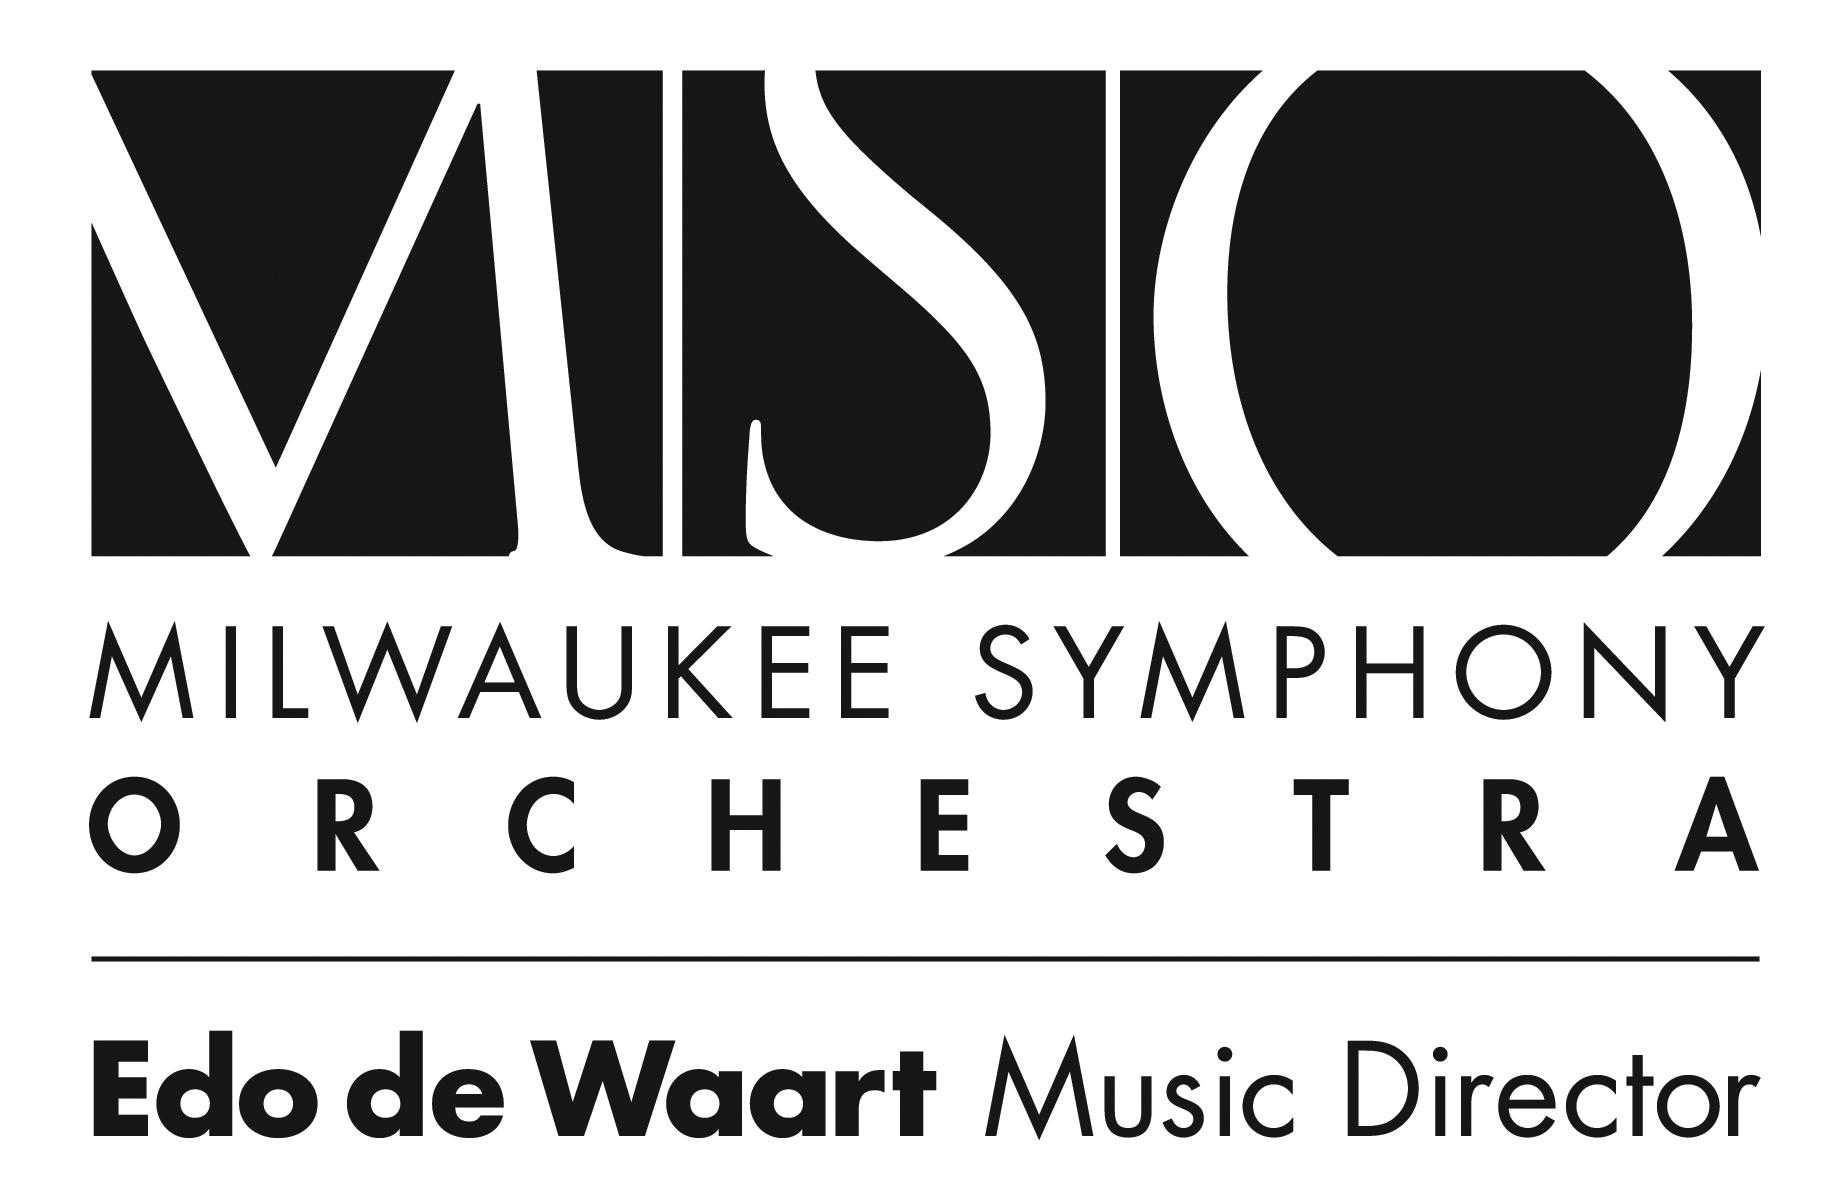 milwaukee symphony orchestra | wxxi-fm